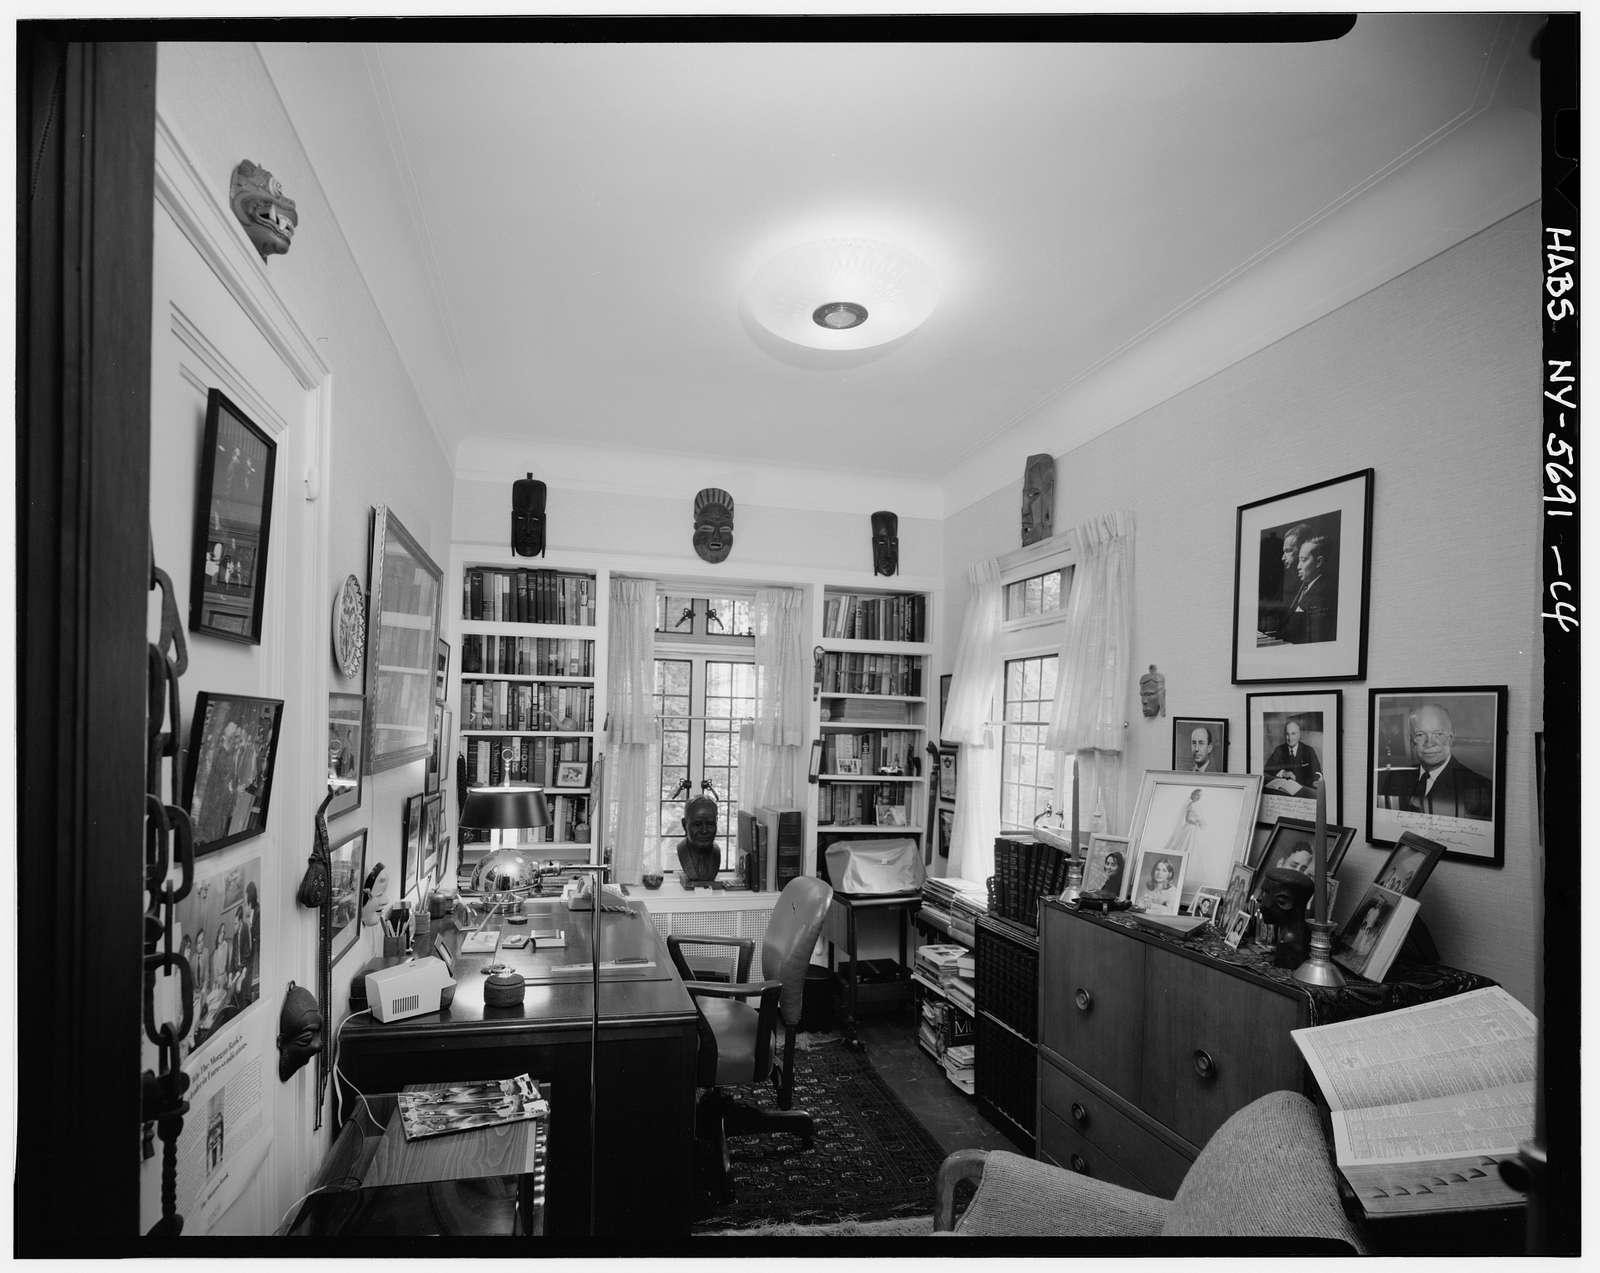 Ralph Bunche House, 115-125 Grosvenor Road, Kew Gardens, Queens County, NY